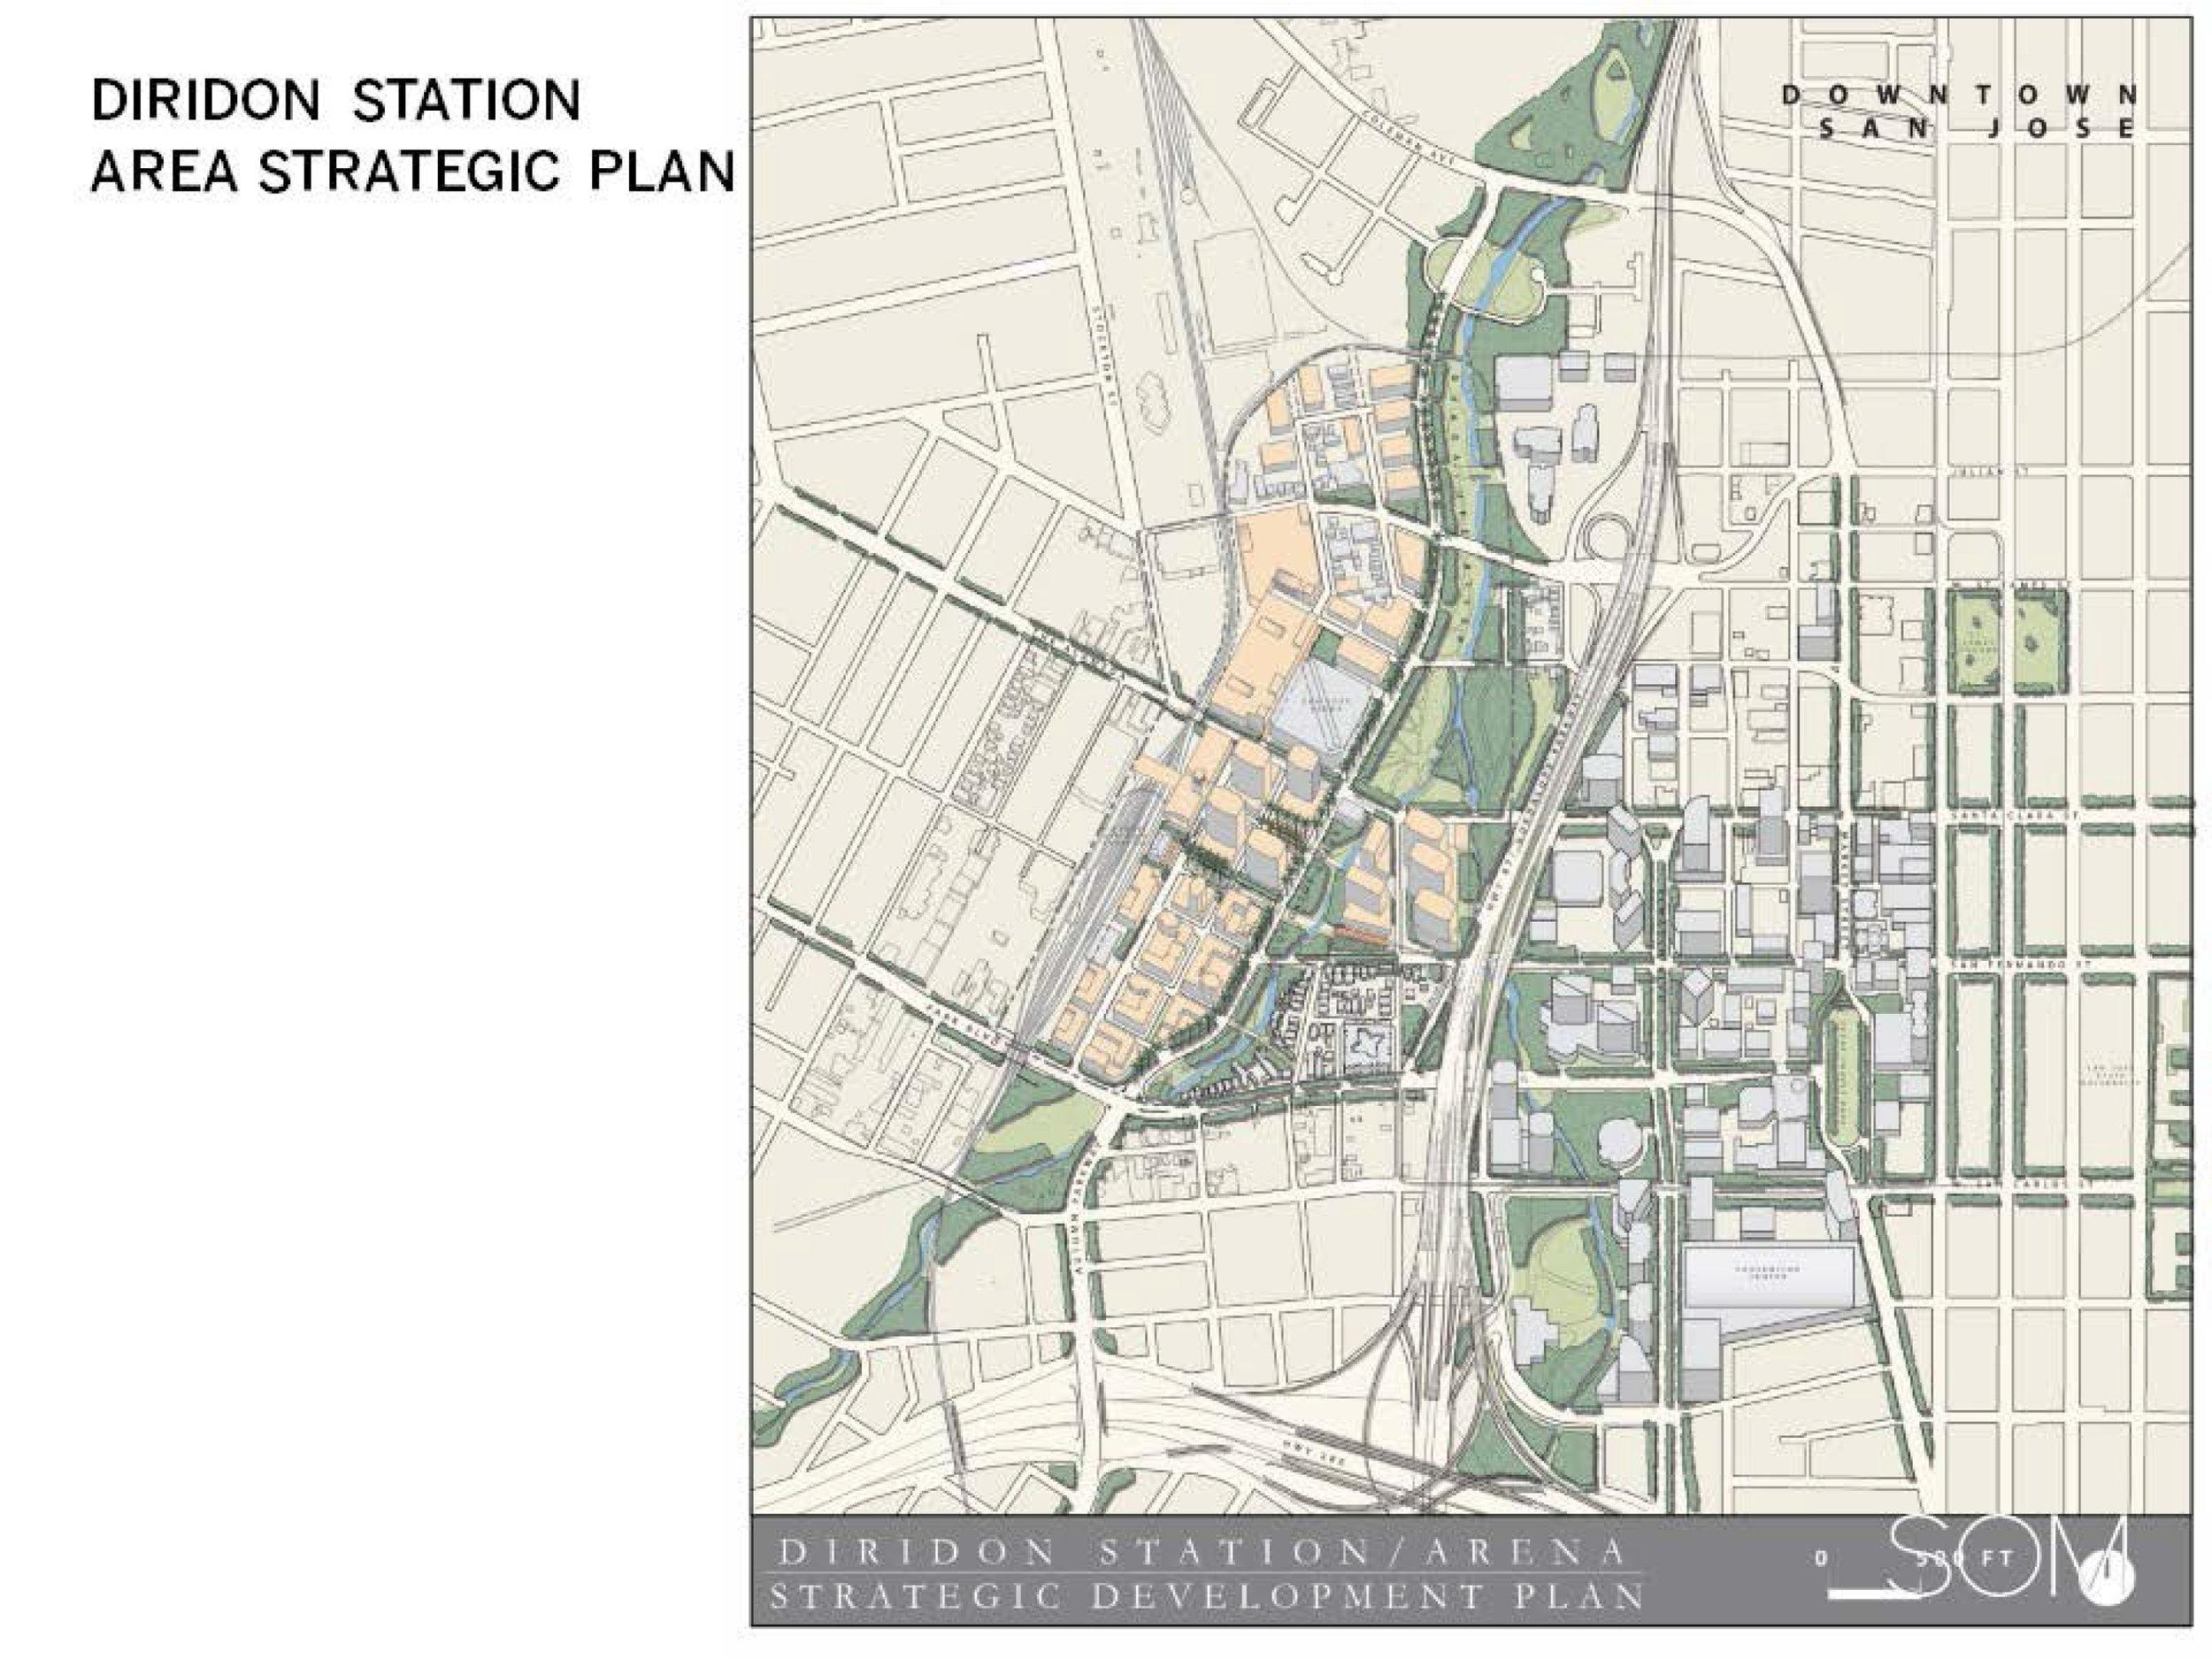 MIT ARCHITECTURE 150 SAN FRANCISCO SLIDESHOW-96 copy.jpg